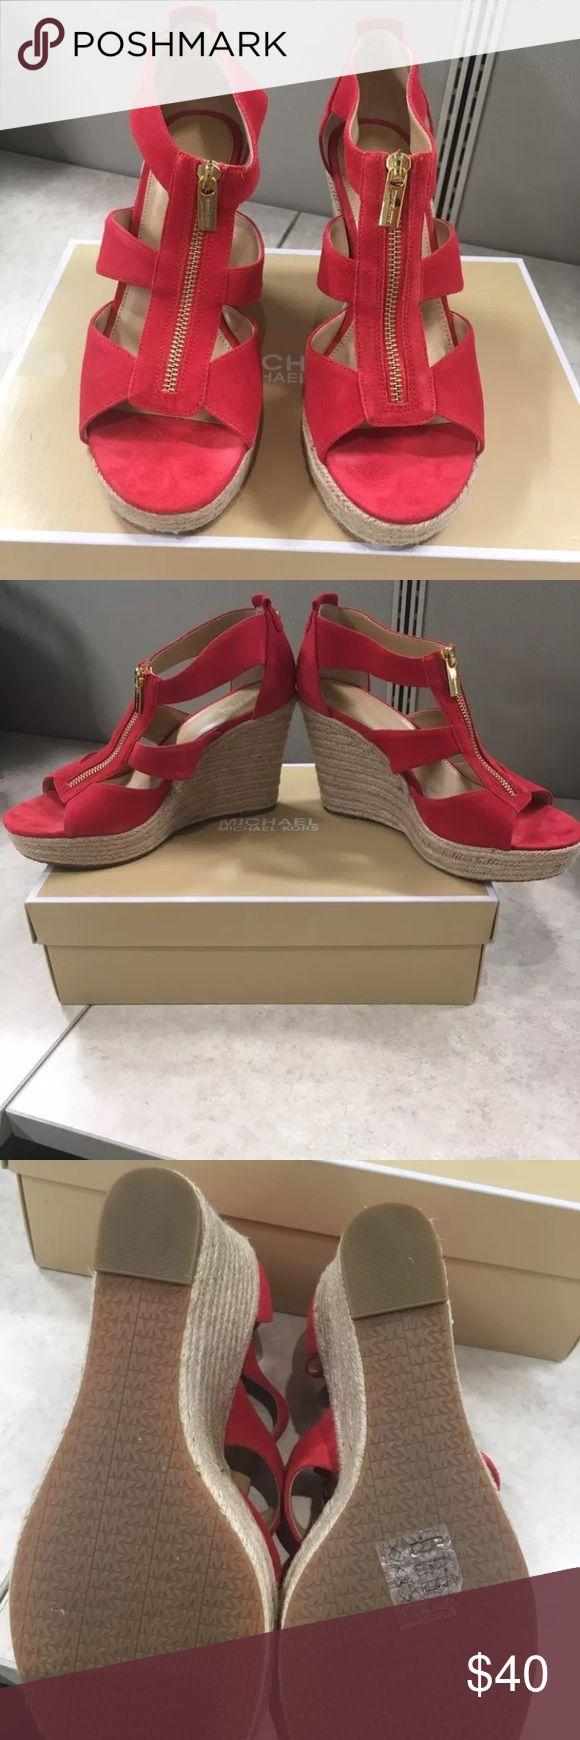 Michael Kors Damita Wedge Sandals size 10 Beautiful red suede Michael Kors Dakota style wedge sandals. Worn once on carpet. Michael Kors Shoes Wedges